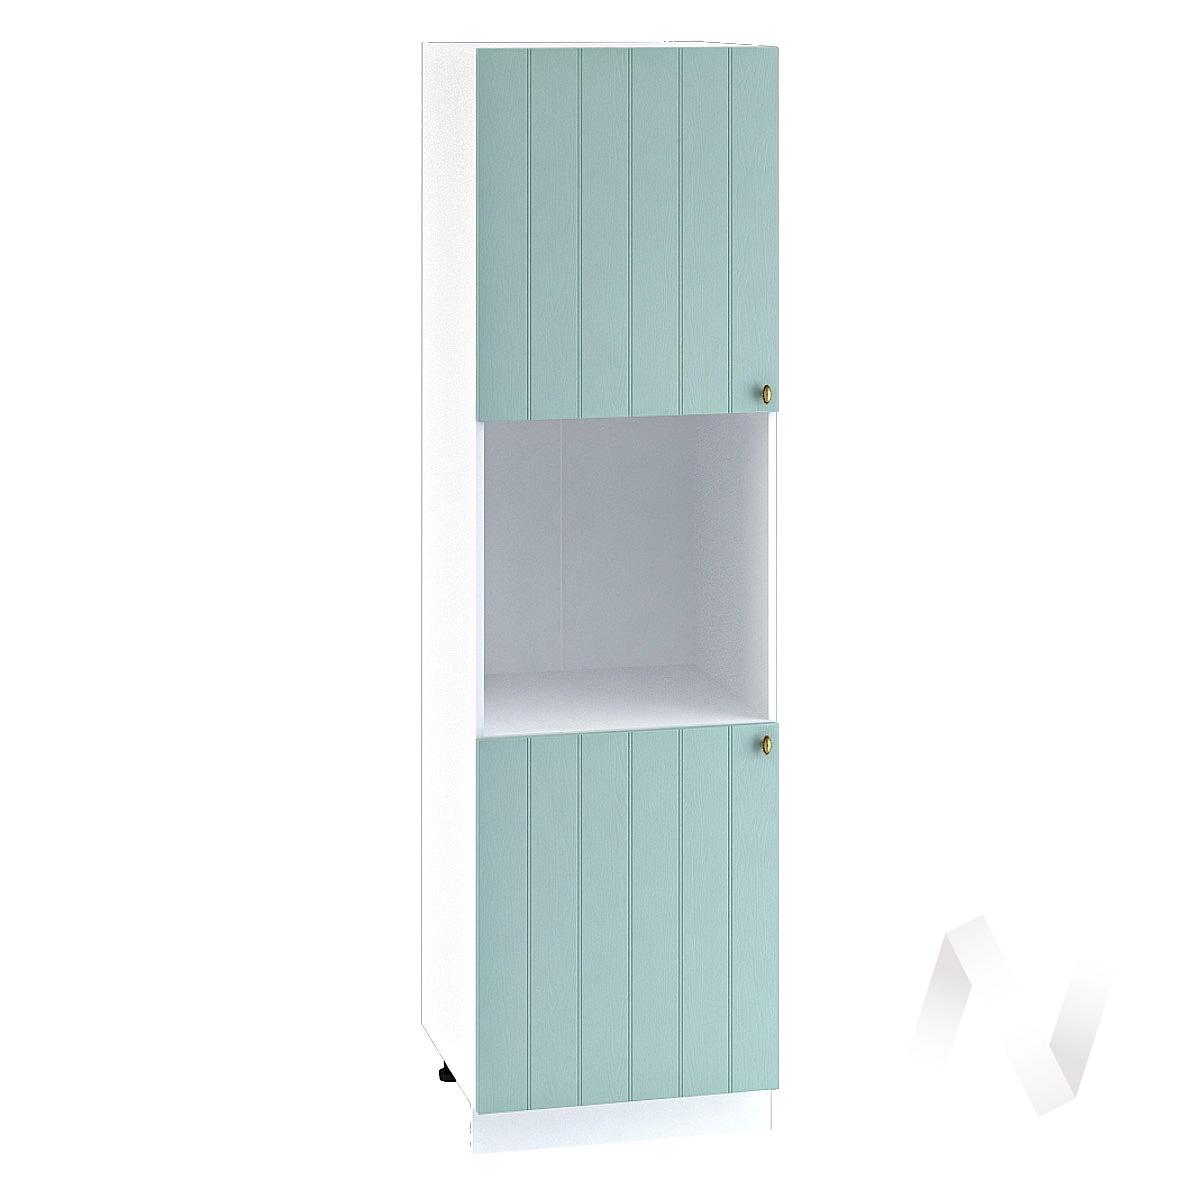 "Кухня ""Прованс"": Шкаф пенал 600, ШП 600 (голубой/корпус белый)"